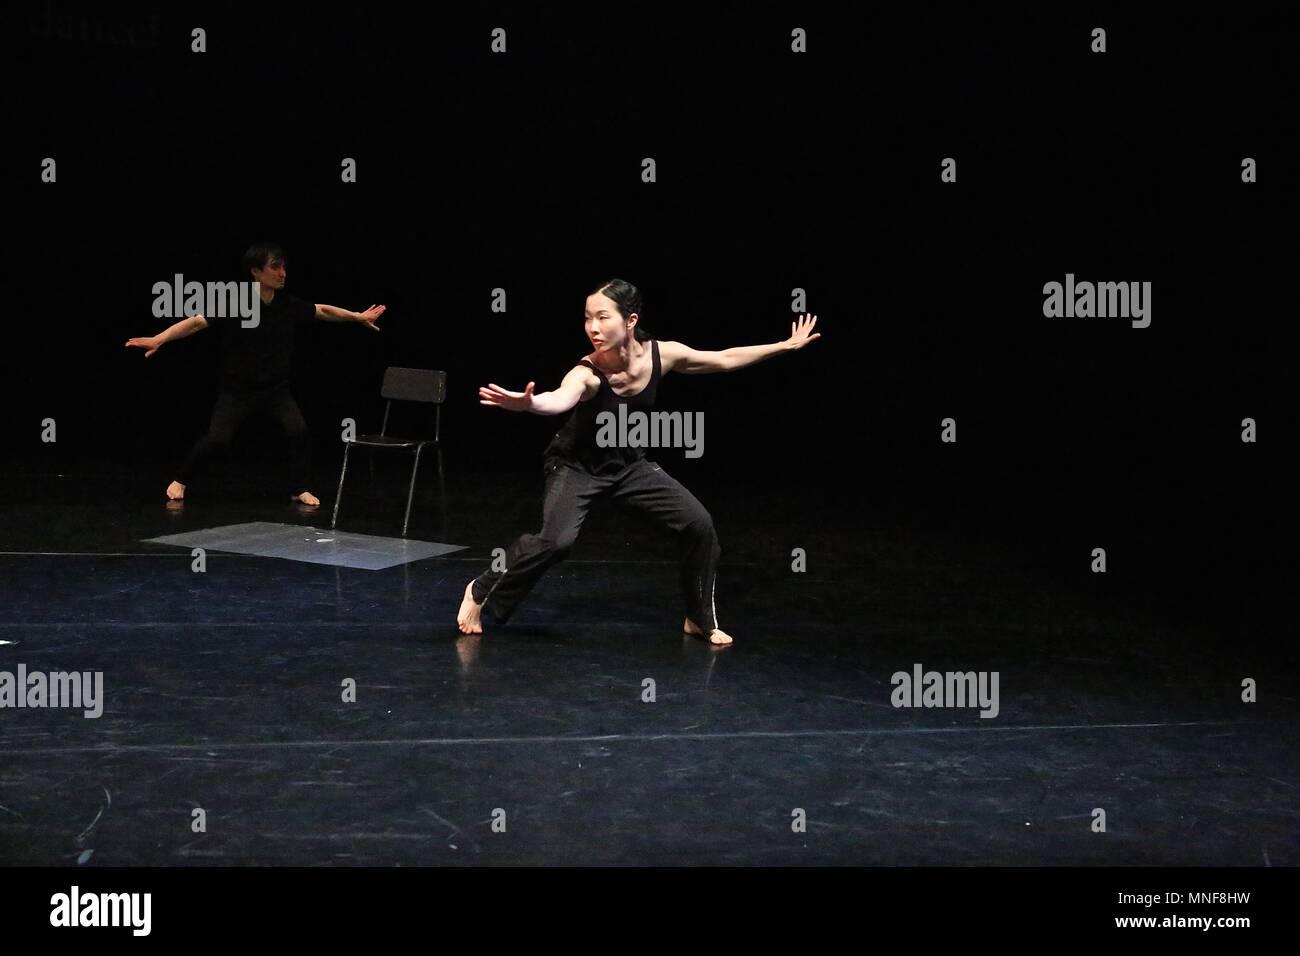 Lyon Eun Kwon - Glory 16 May 2018 - Stock Image